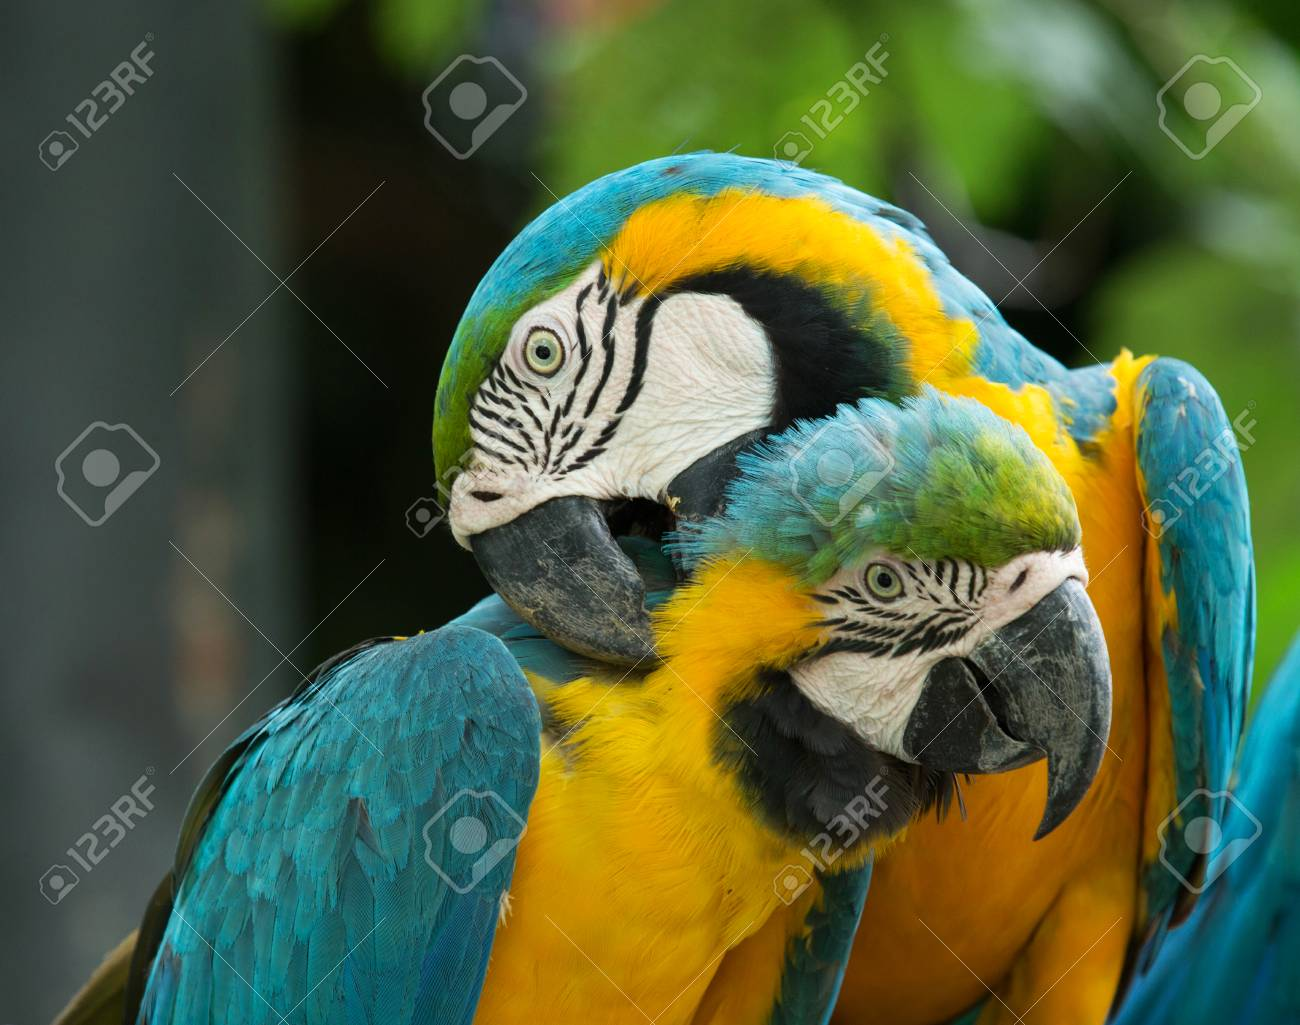 parrot bird sitting on the perch Stock Photo - 22811518